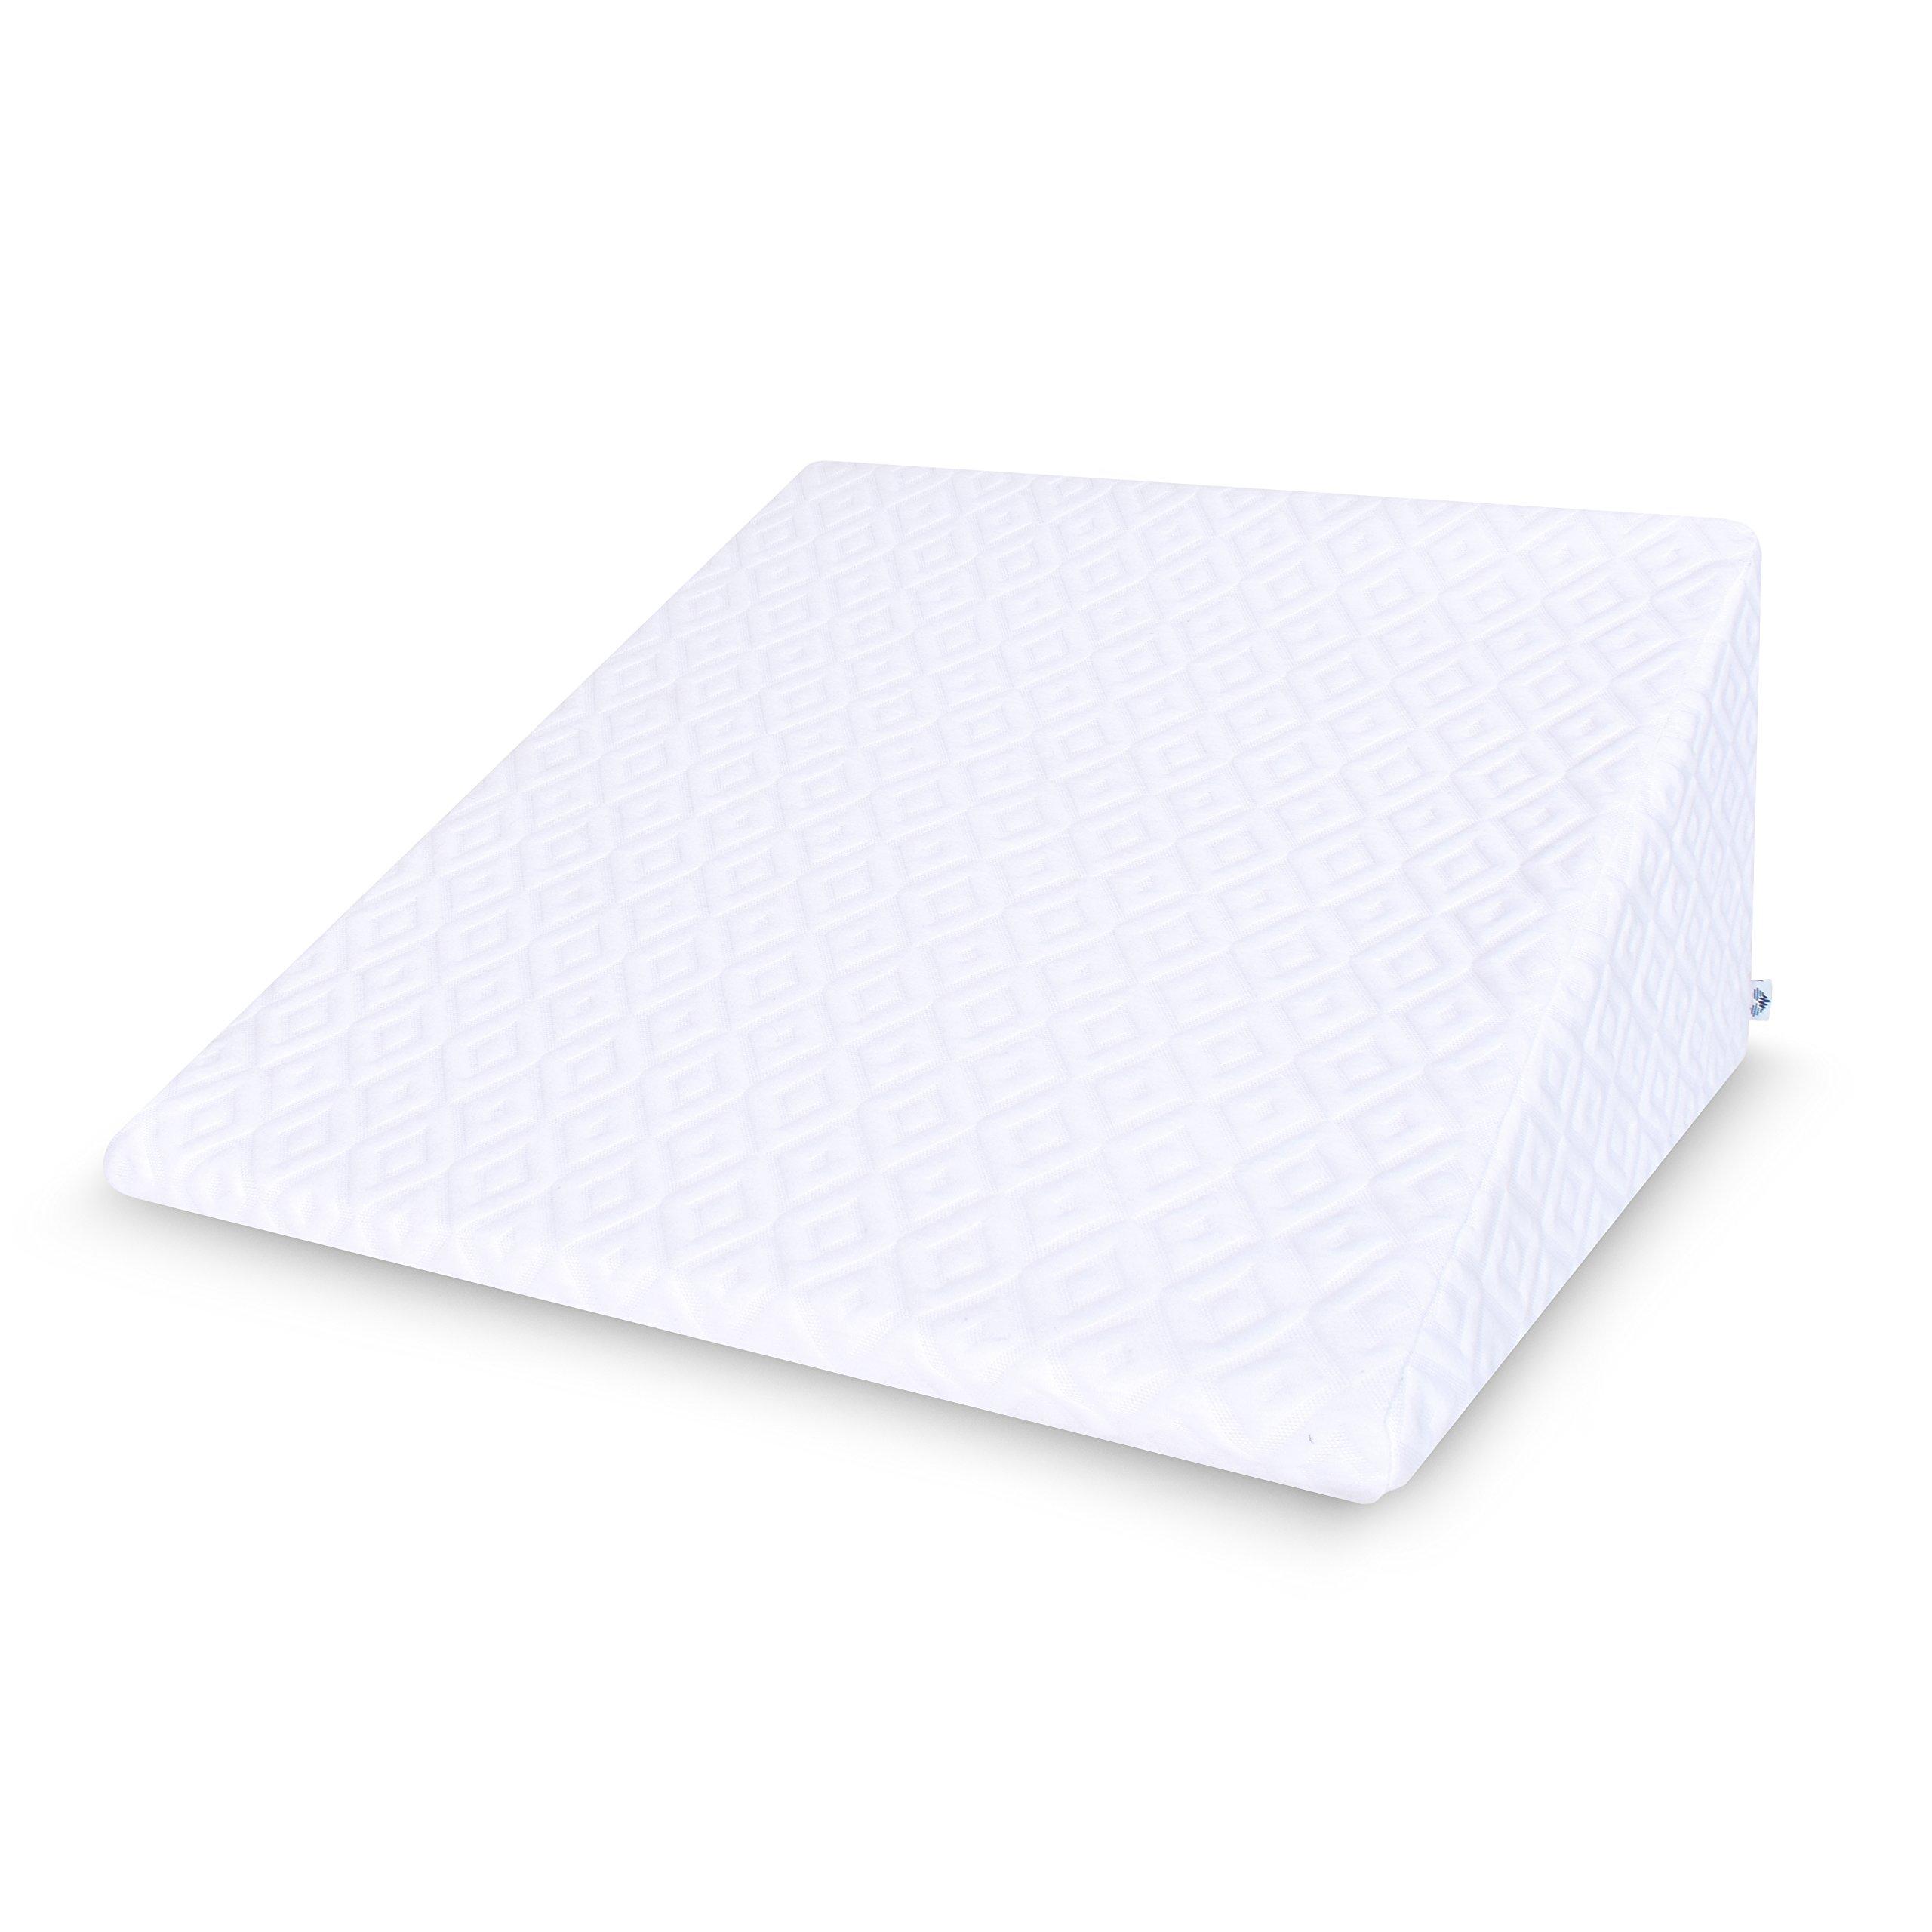 amazon com pharmedoc bed wedge pillow 26 25 7 5